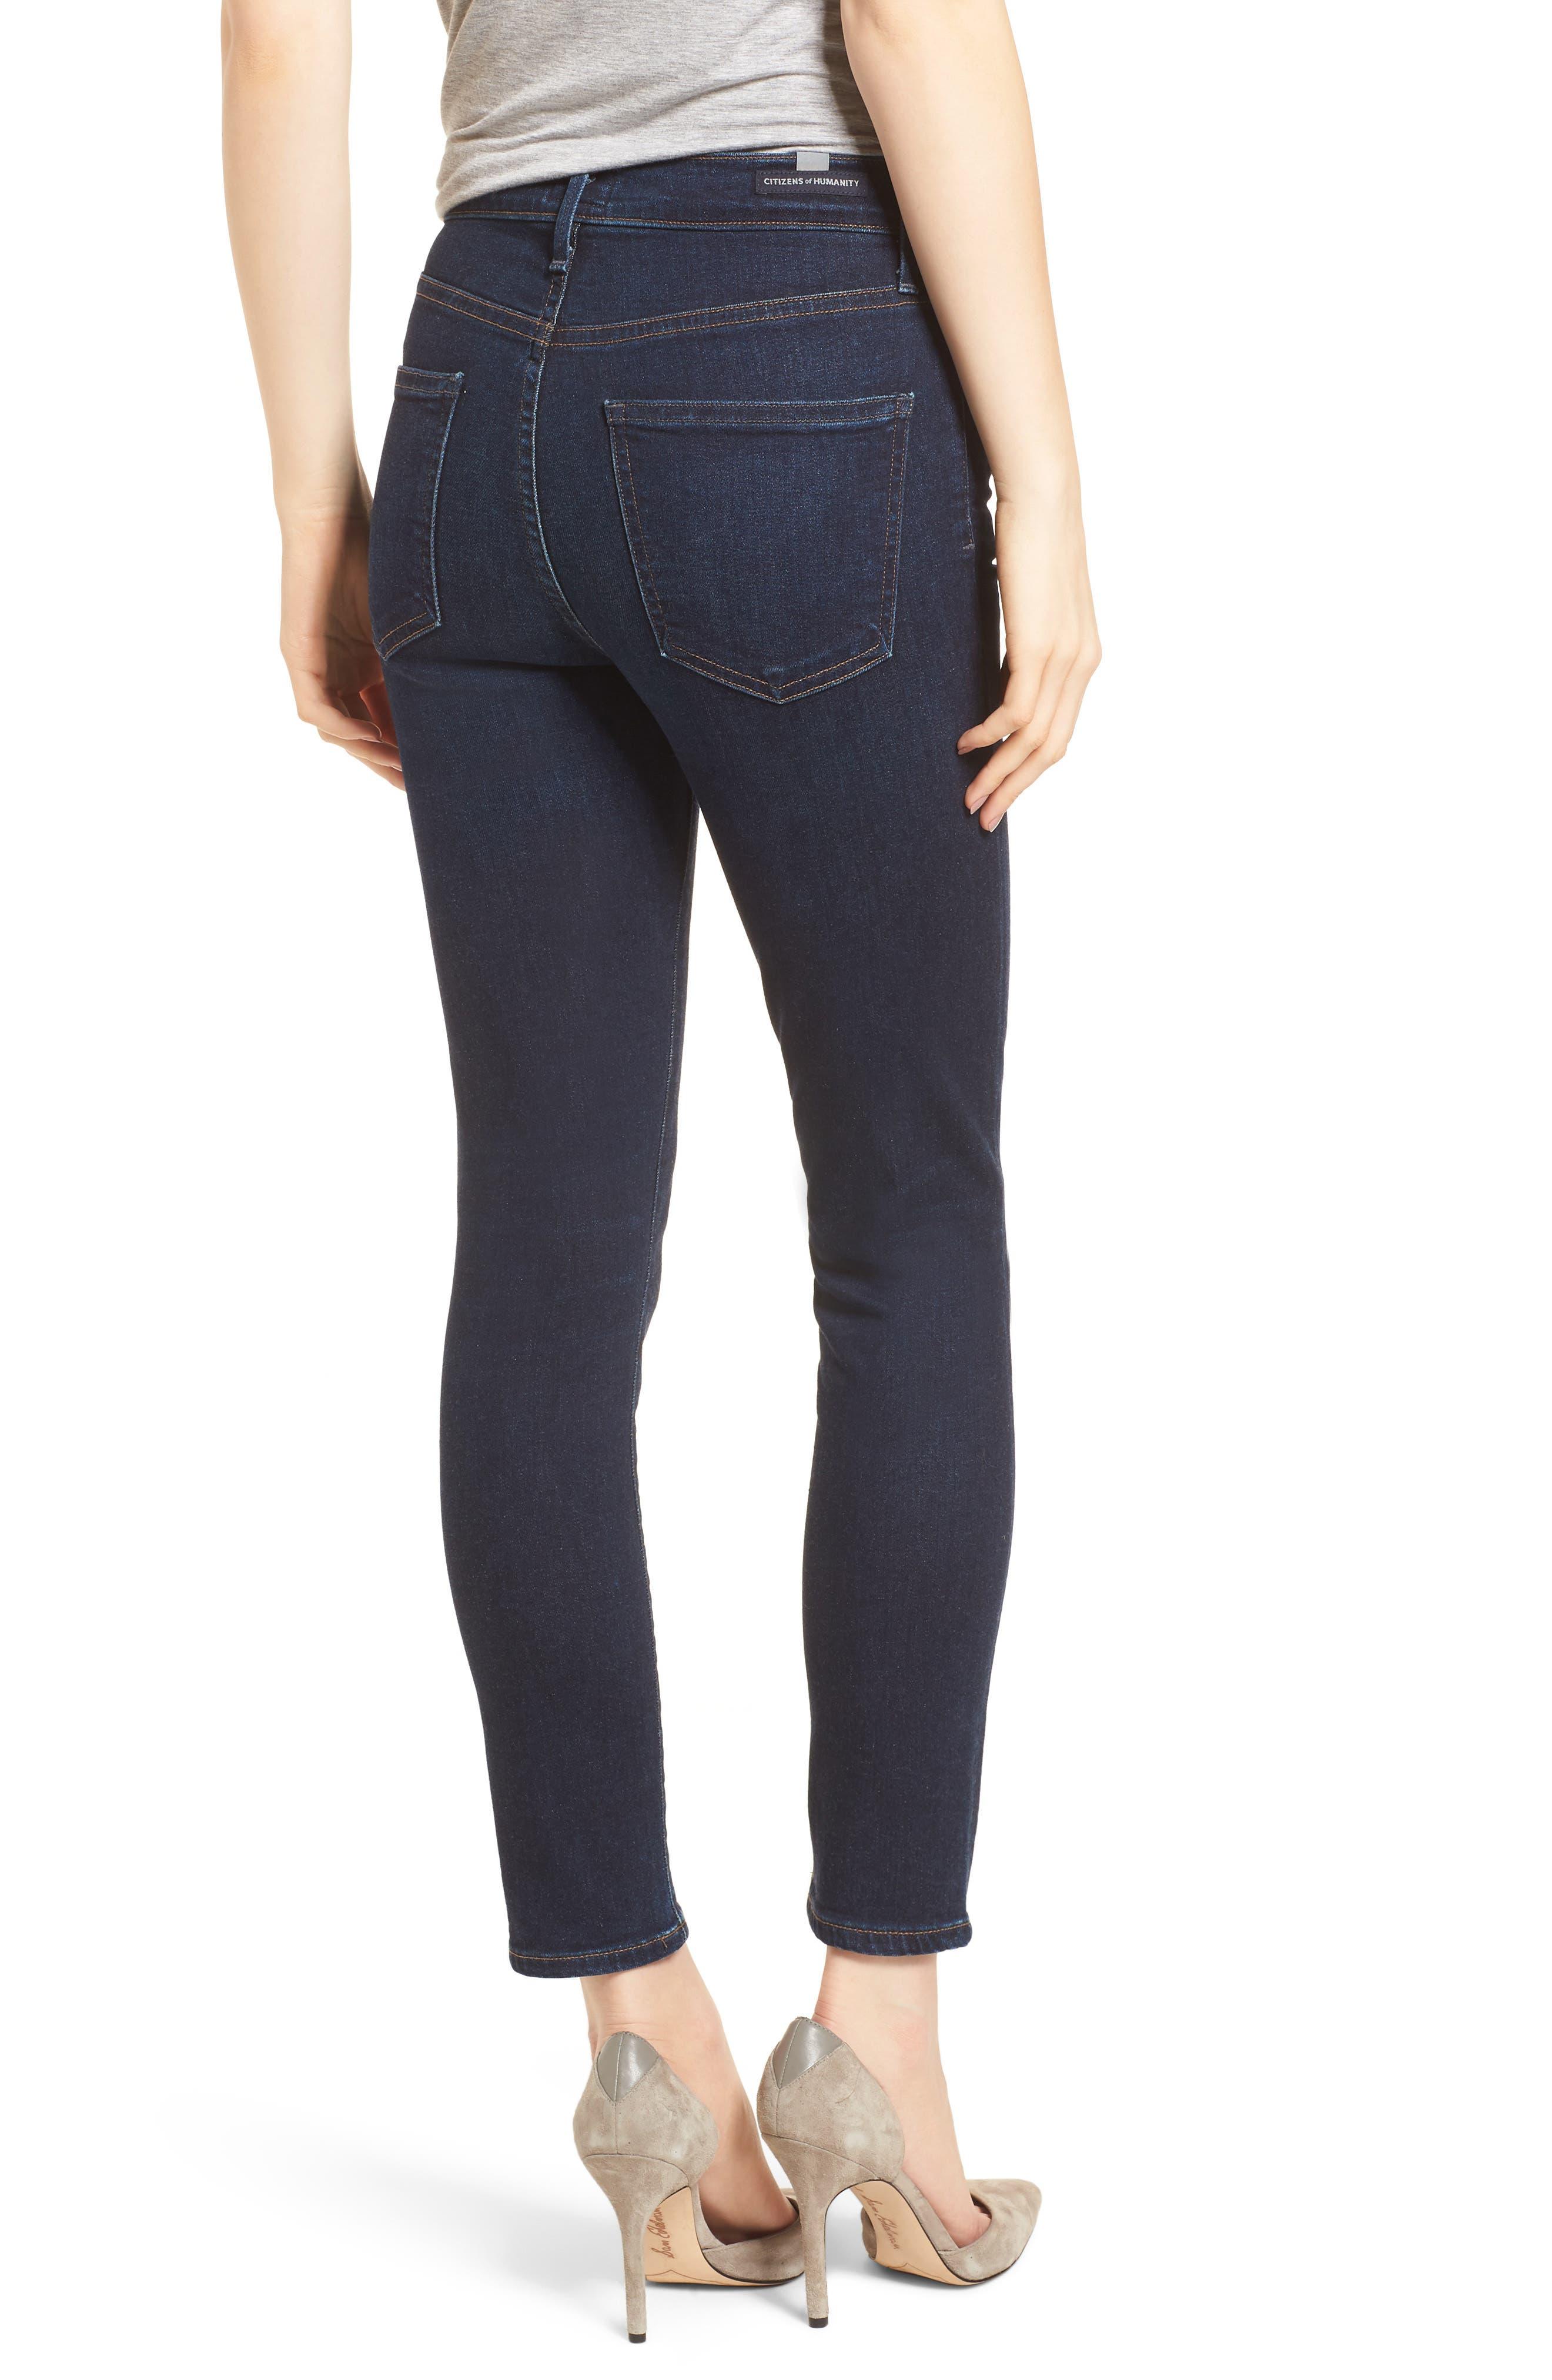 Rocket High Waist Crop Skinny Jeans,                             Alternate thumbnail 2, color,                             484